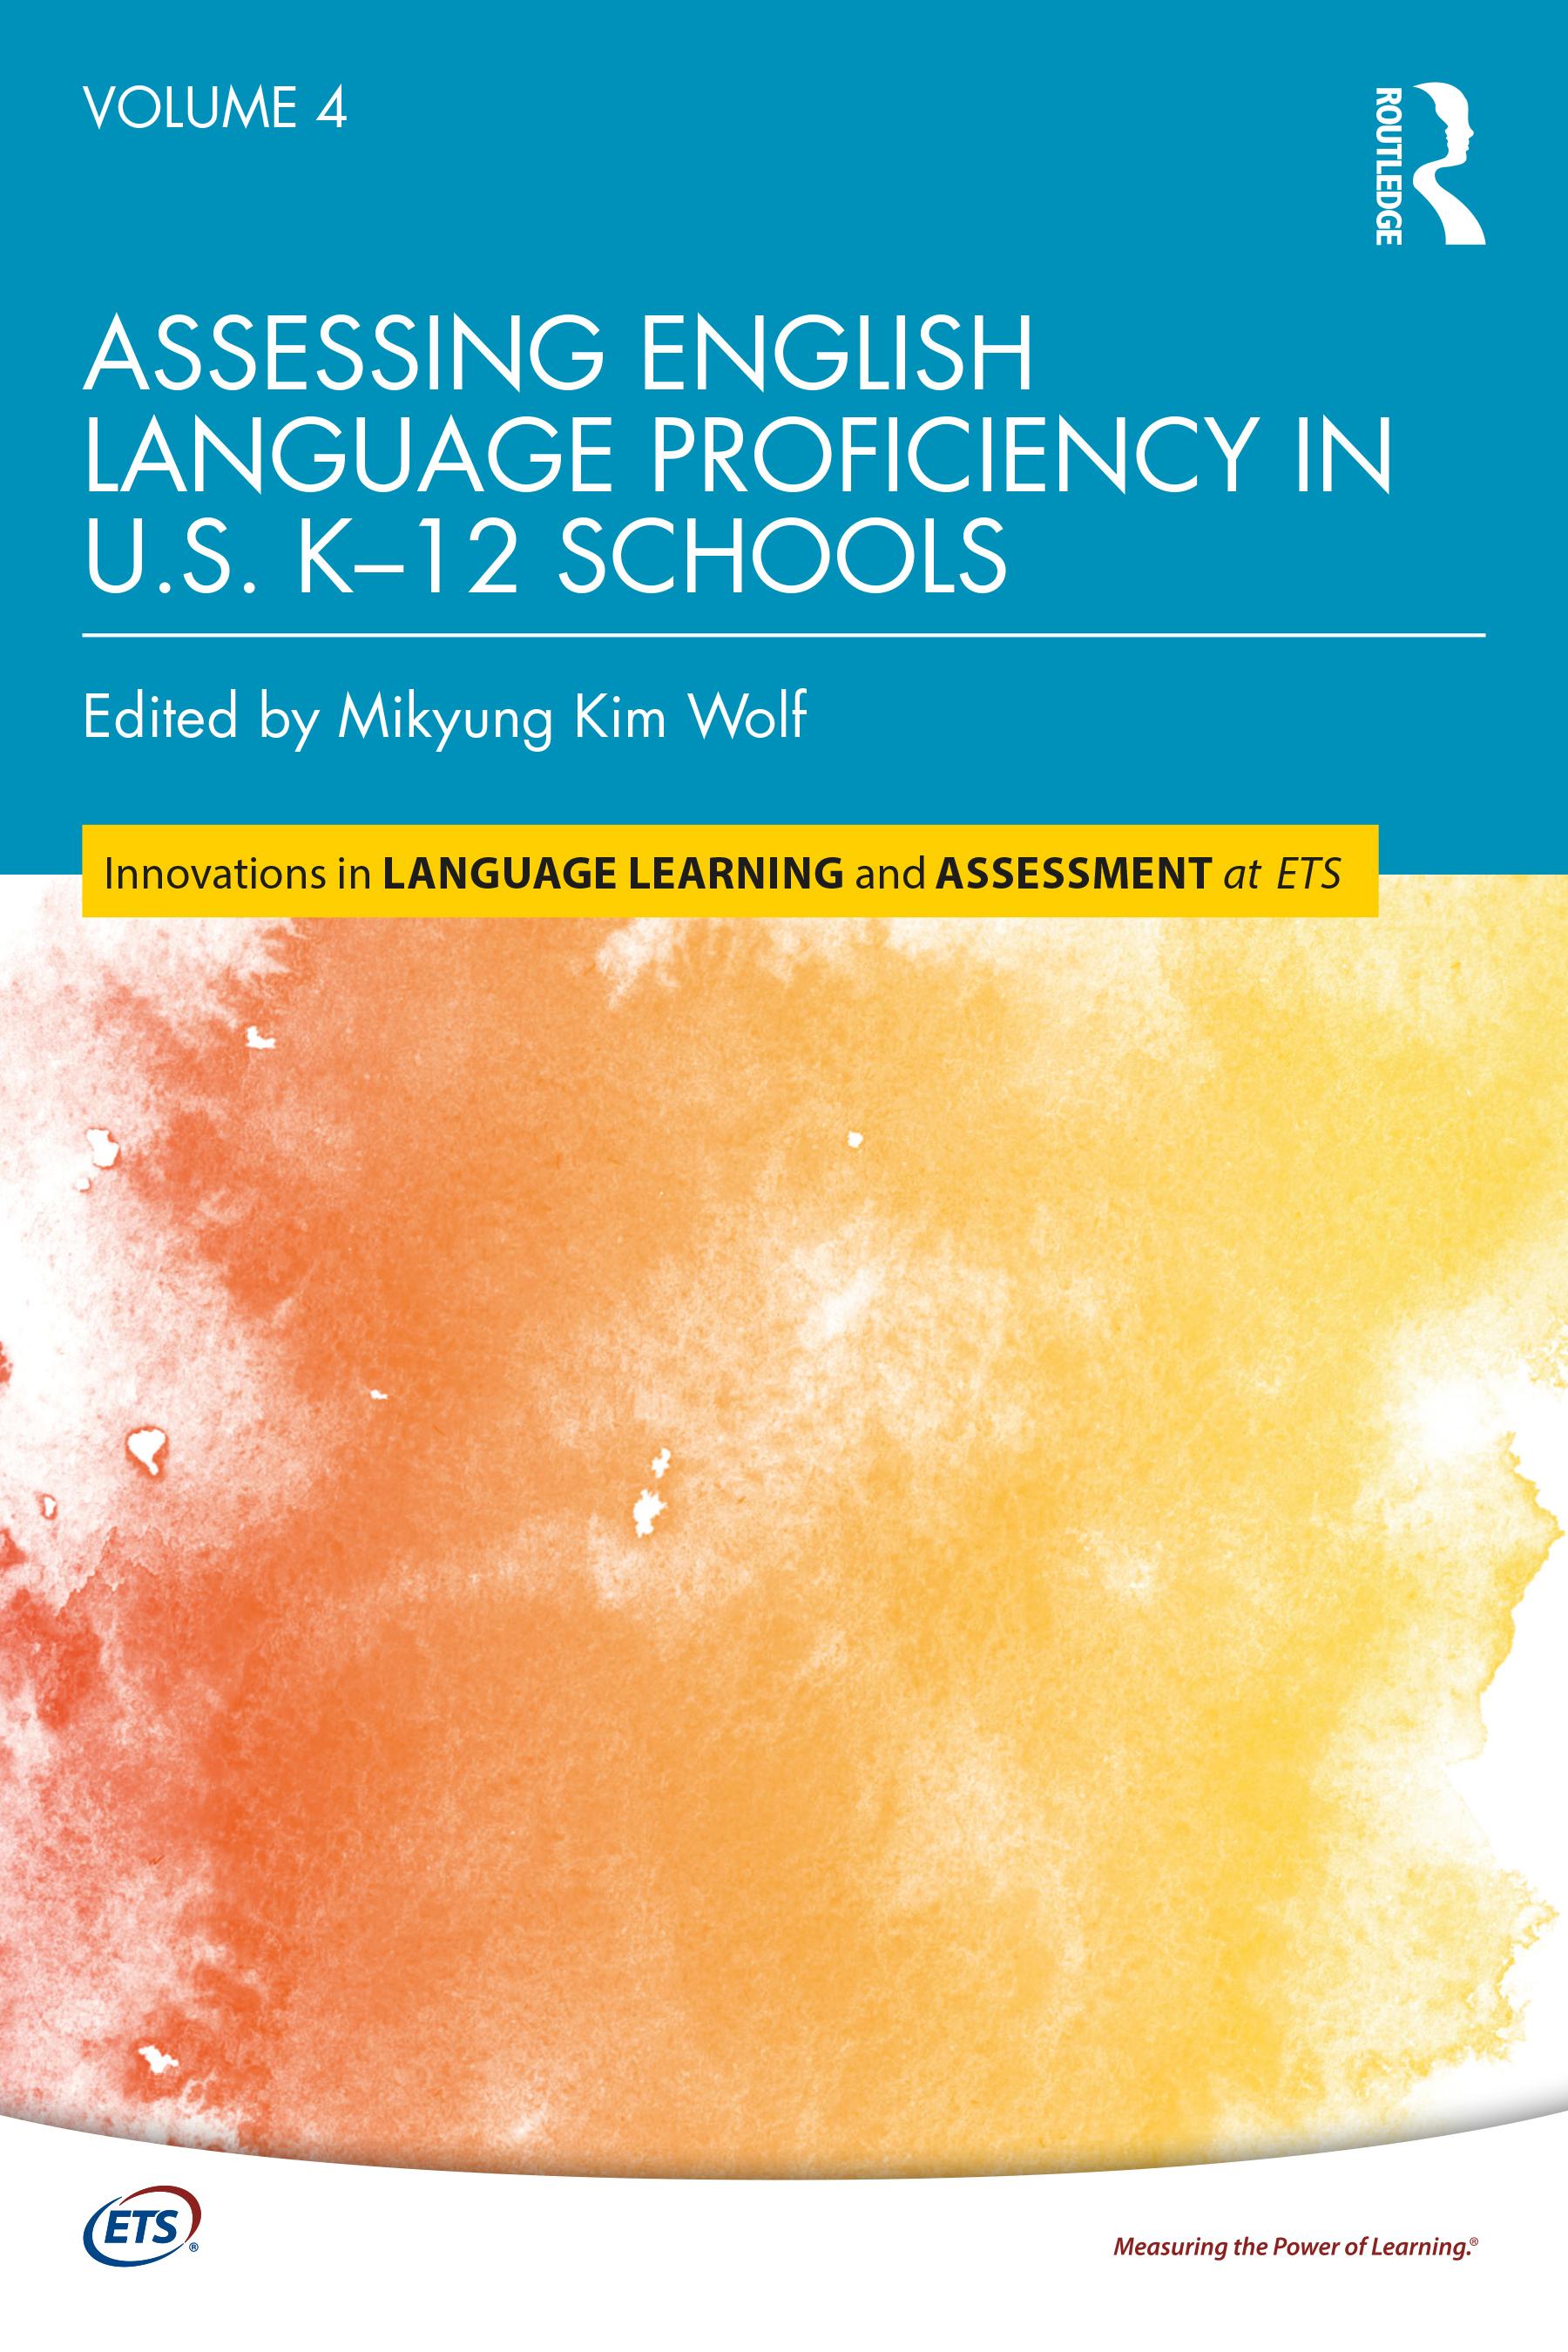 Assessing English Language Proficiency in U.S. K–12 Schools